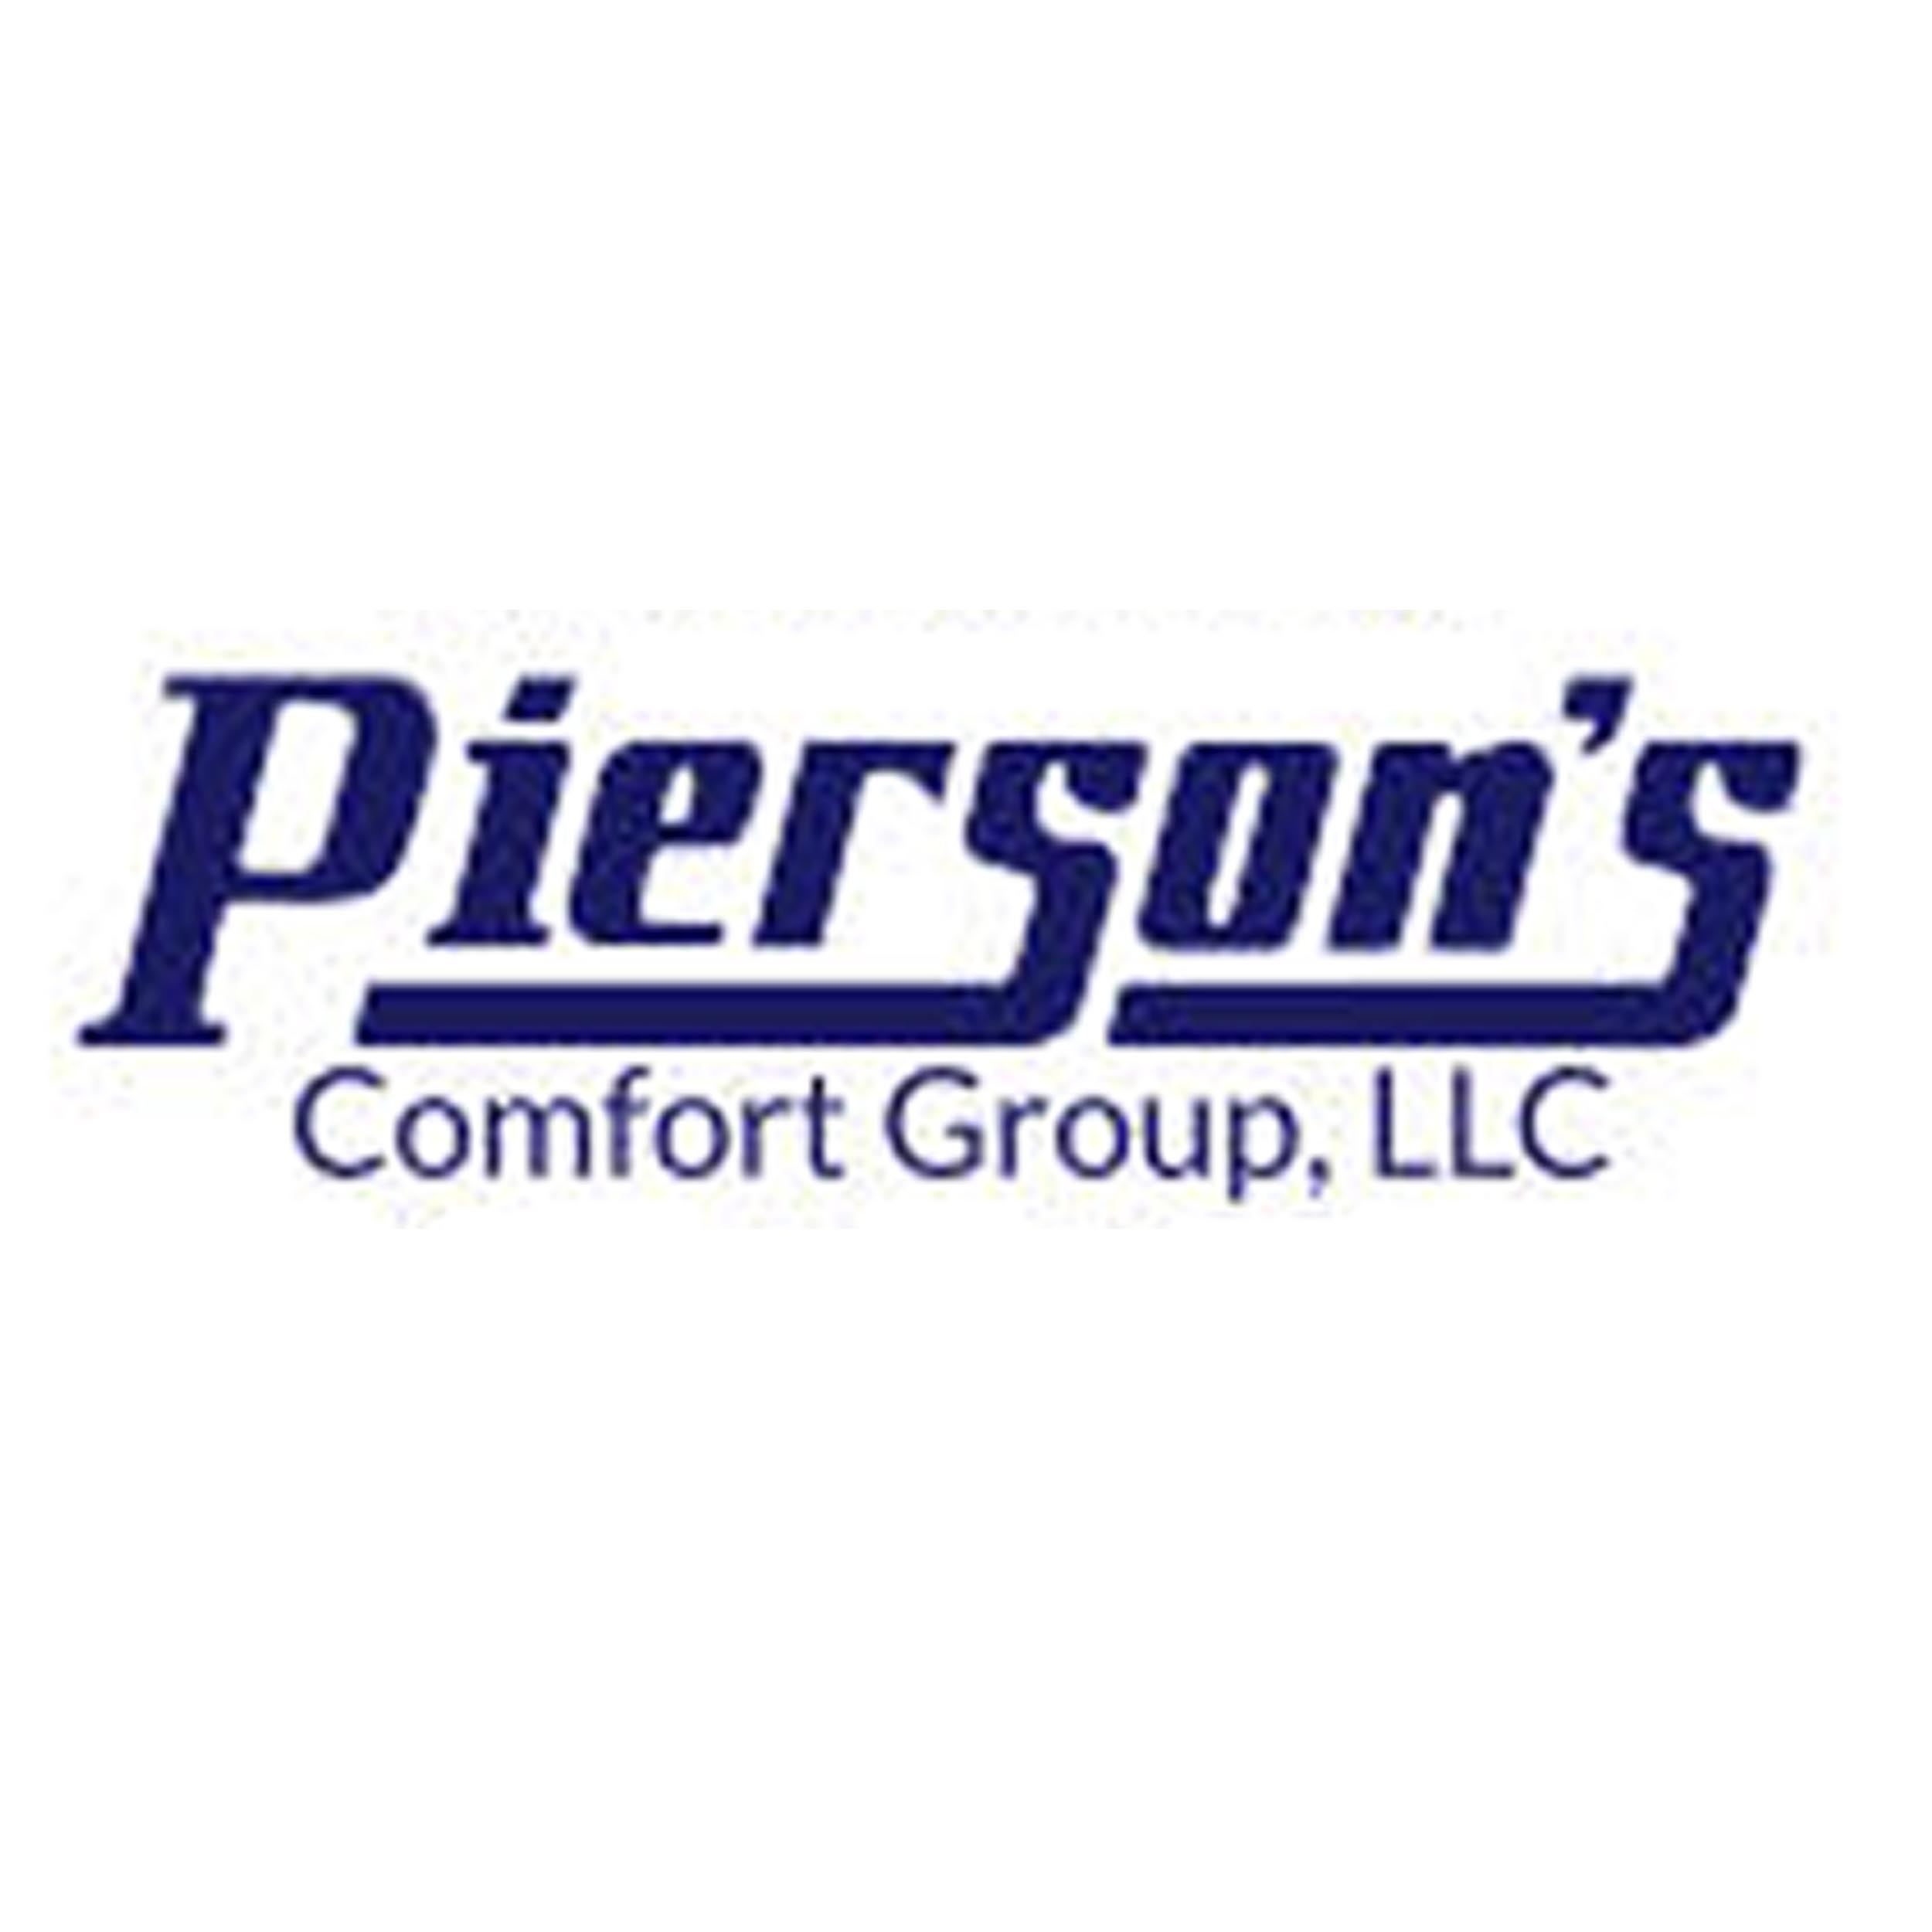 Web Logo - Piersons.jpg